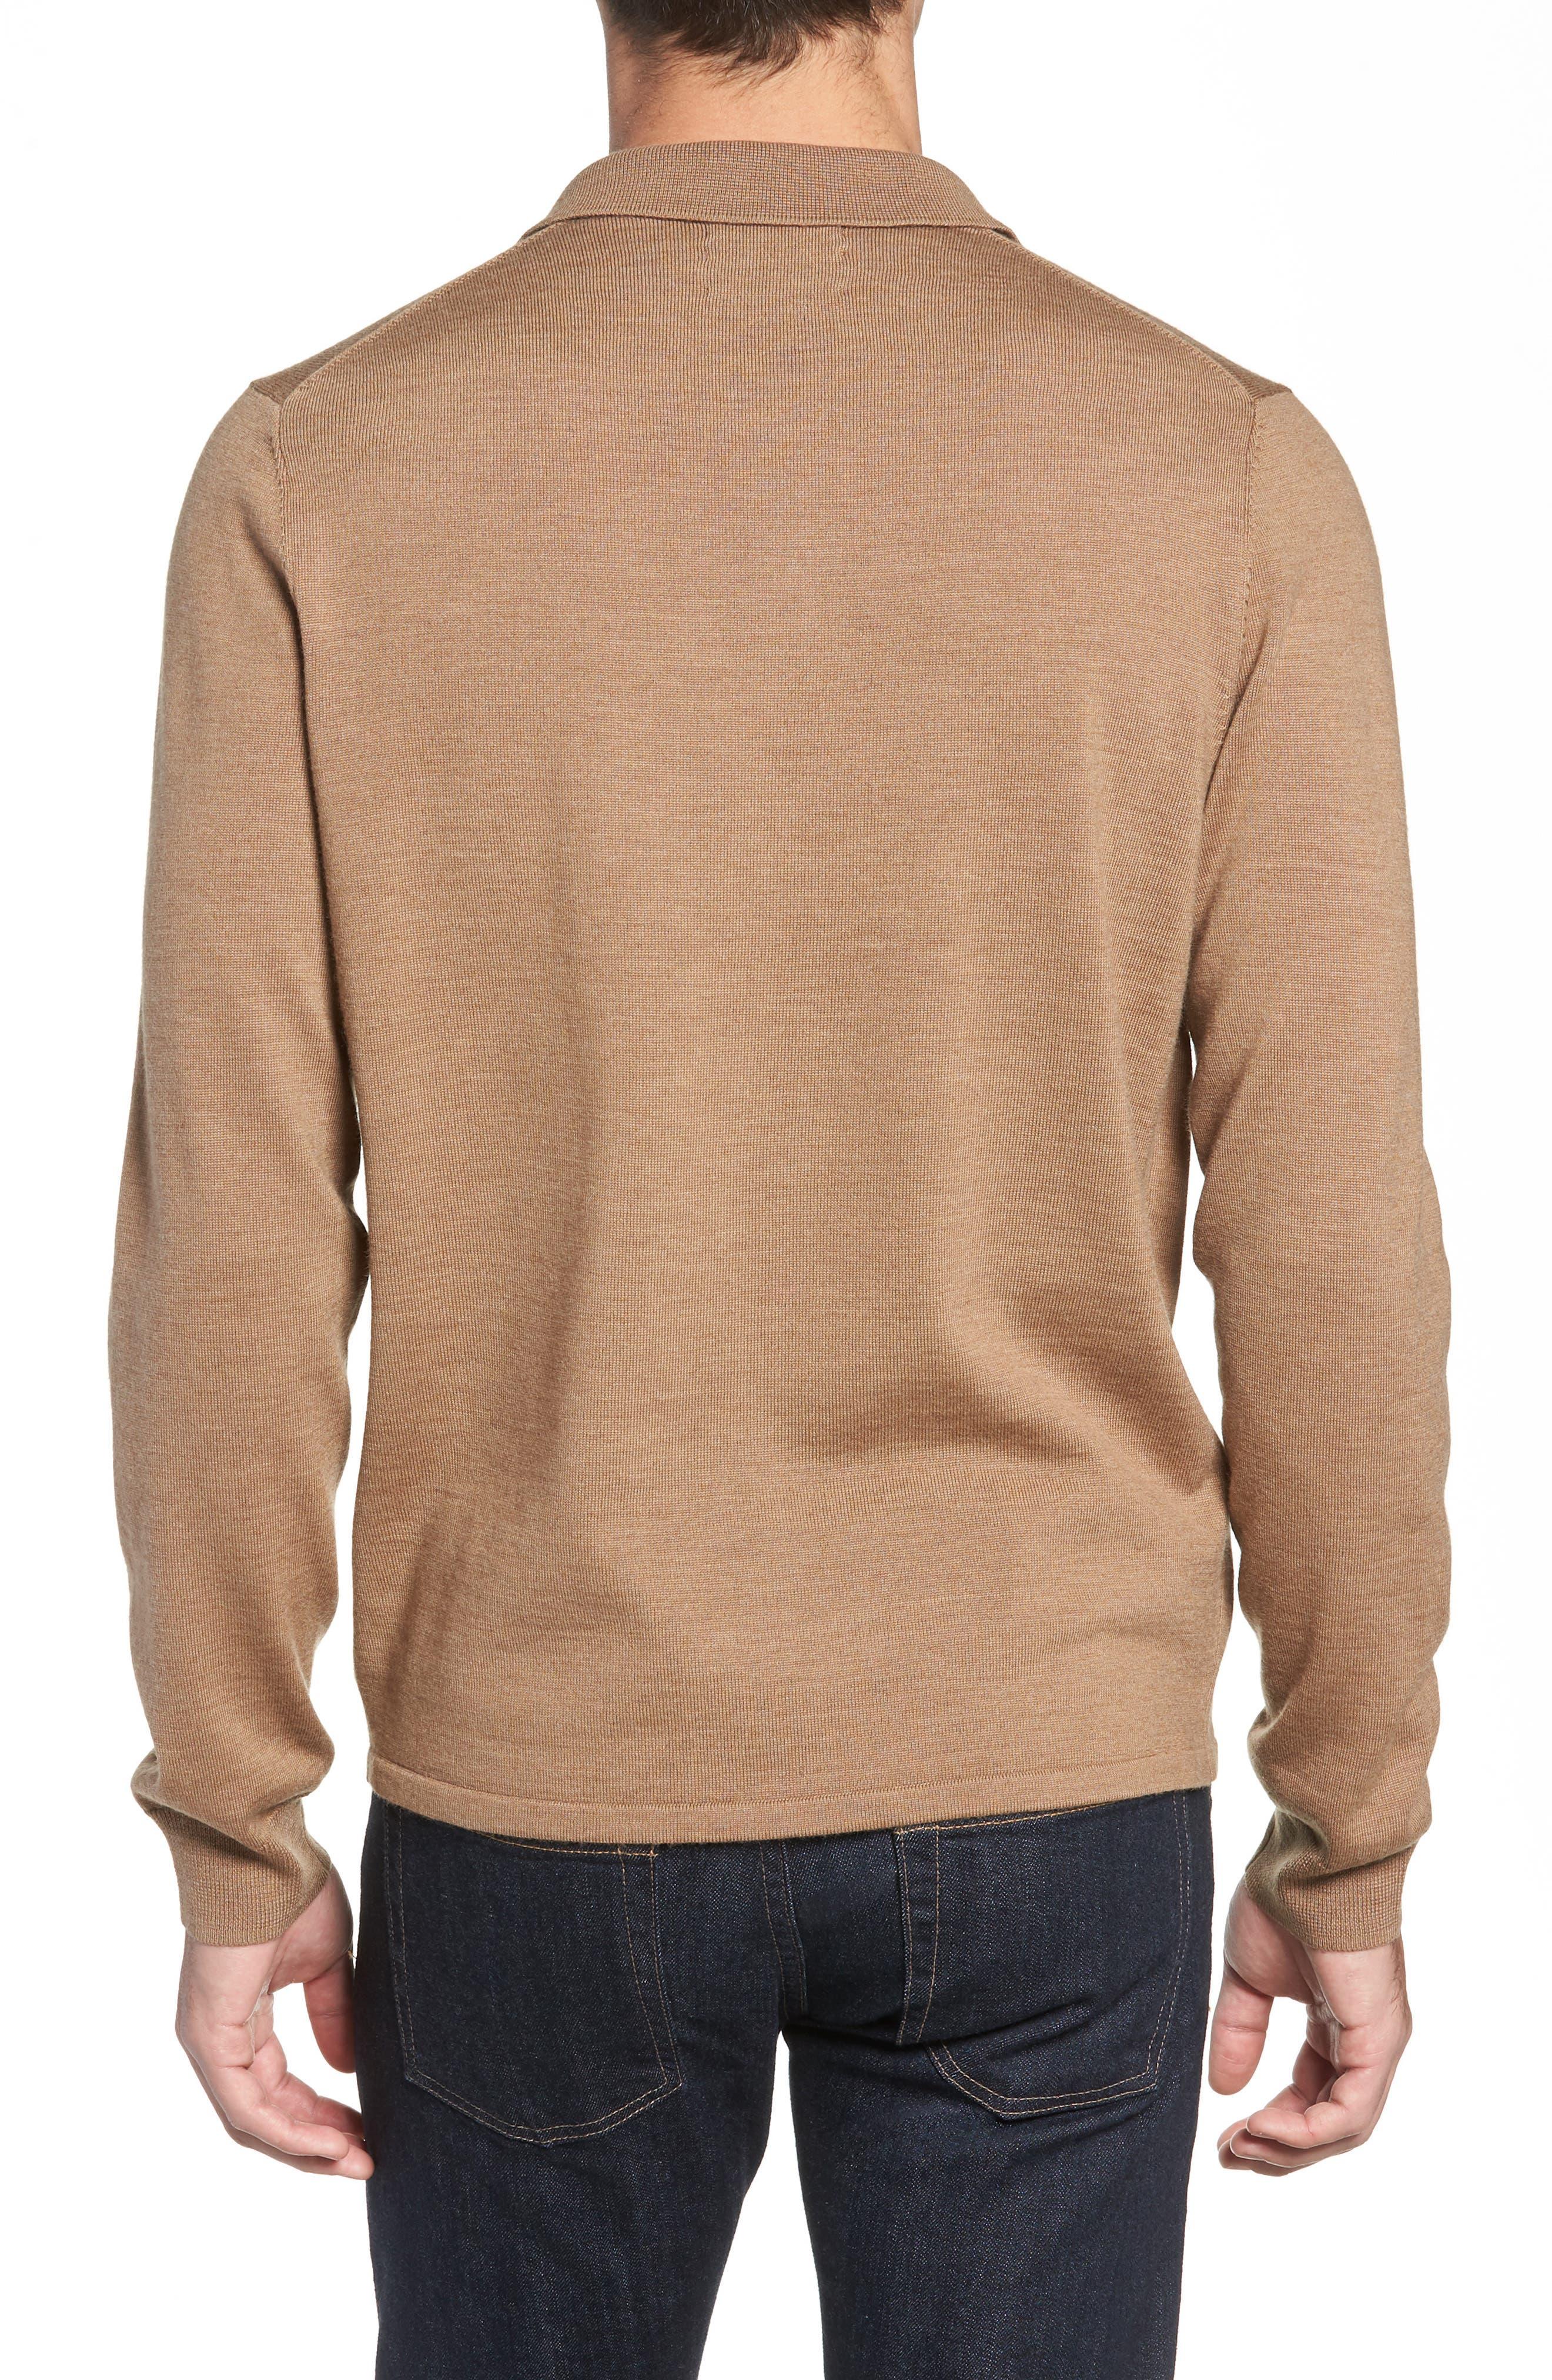 NORDSTROM MEN'S SHOP,                             Merino Wool Polo Sweater,                             Alternate thumbnail 2, color,                             211